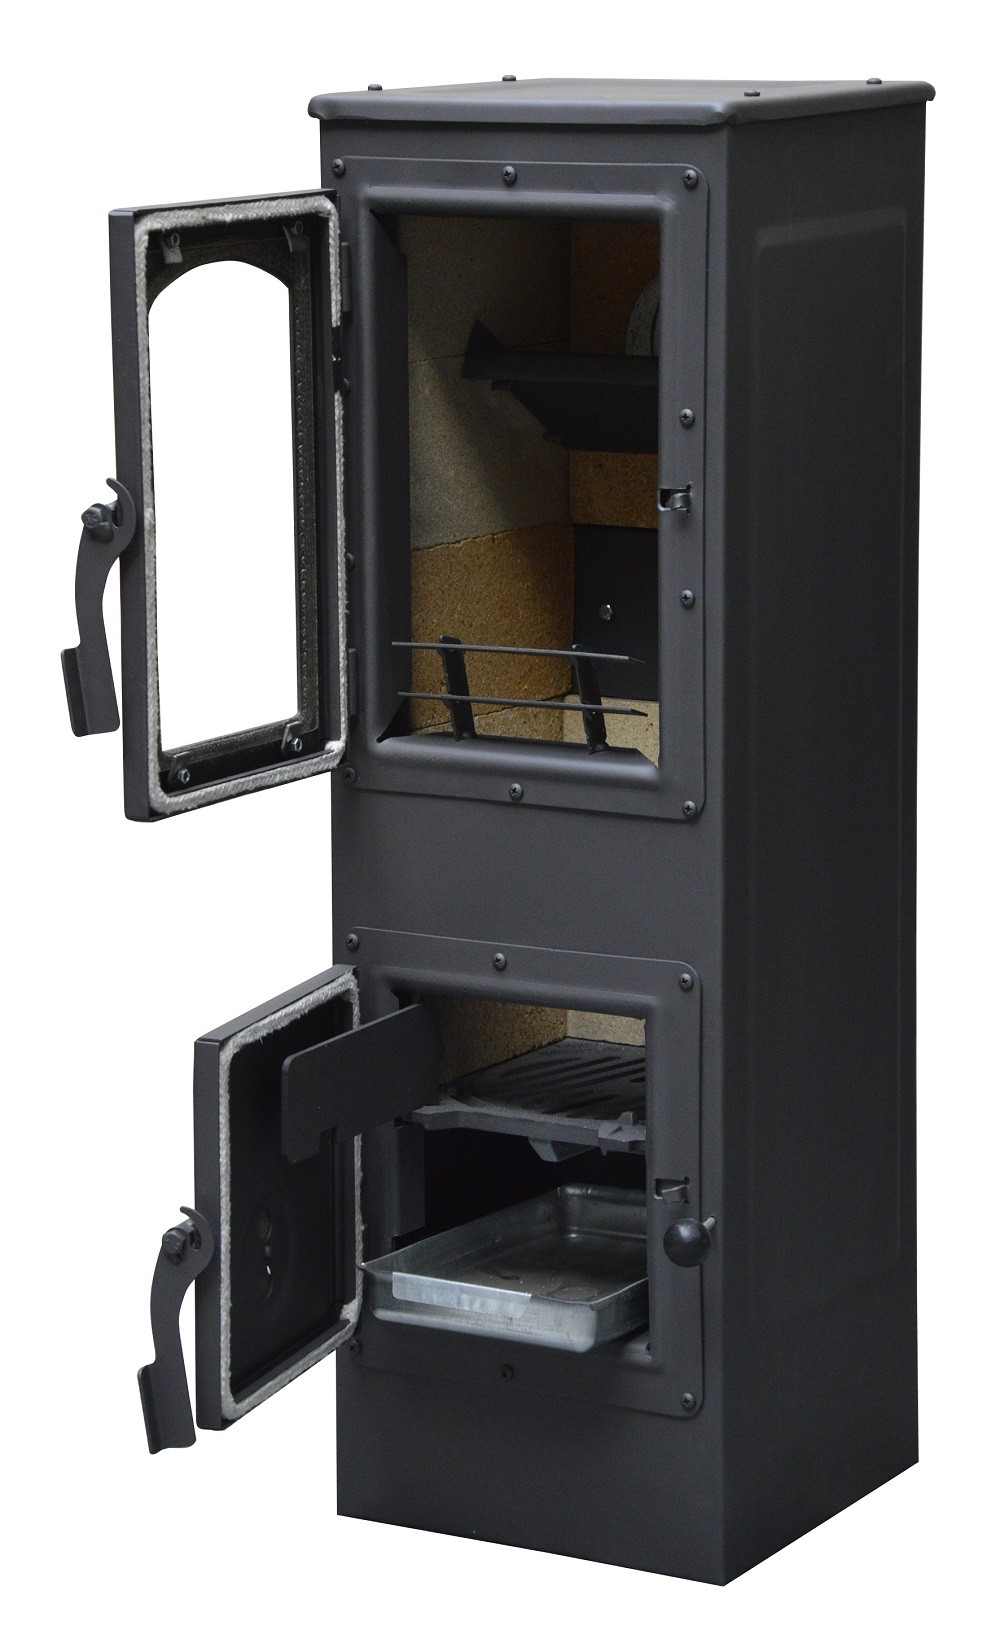 po le a bois 6kw 280x280x890mm warm tech kos ebay. Black Bedroom Furniture Sets. Home Design Ideas